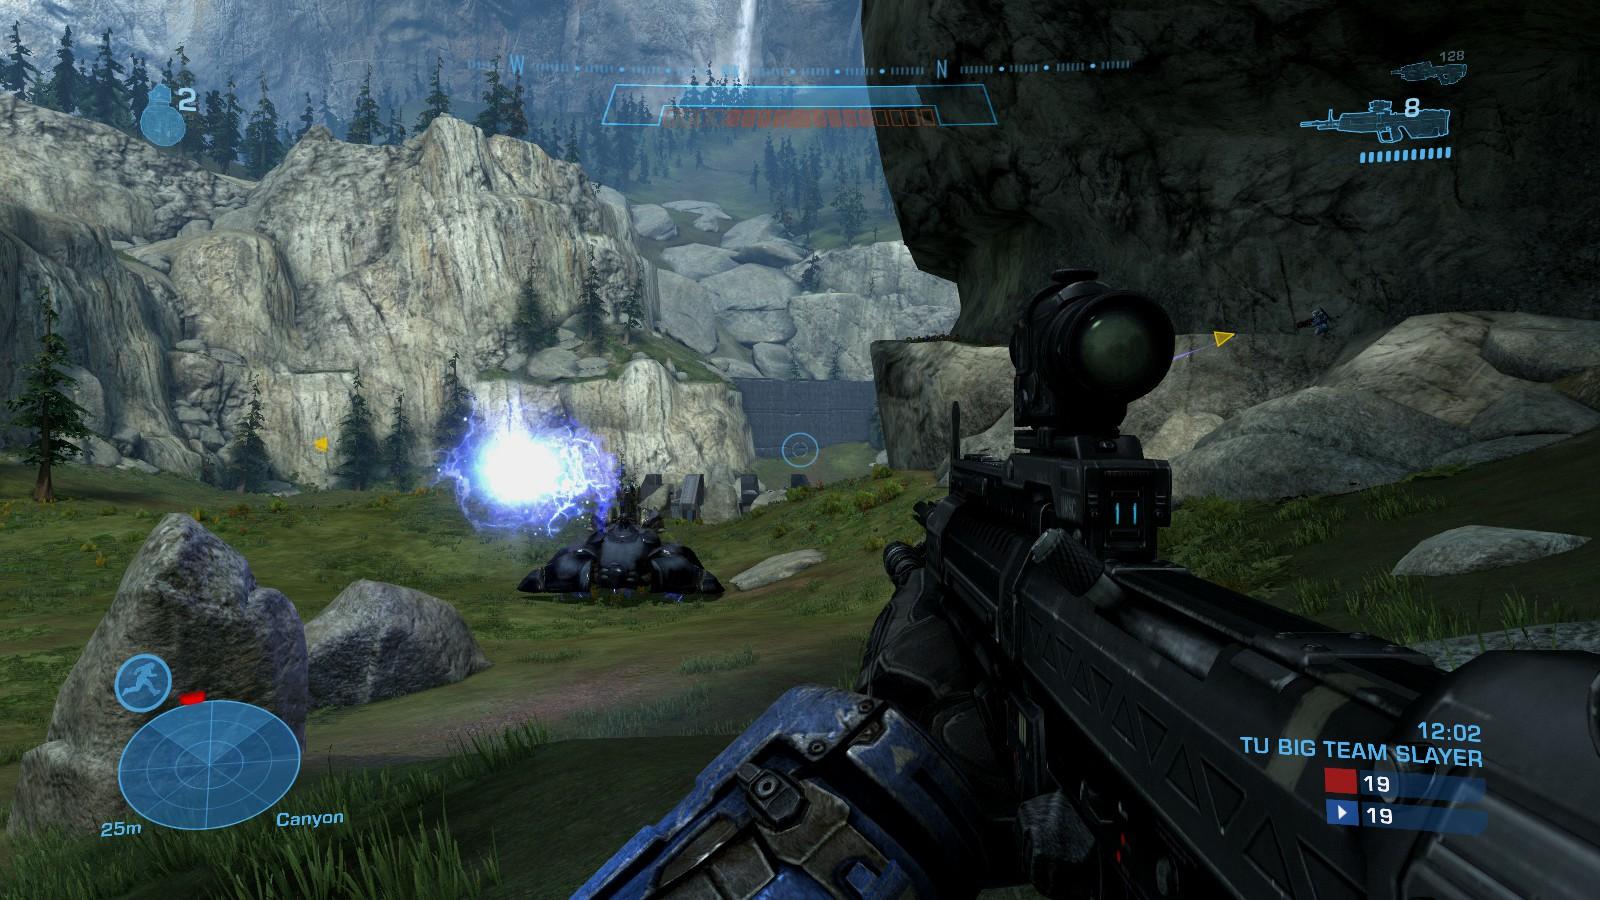 5 Reasons Reach Is The Best Halo Game Rock Paper Shotgun